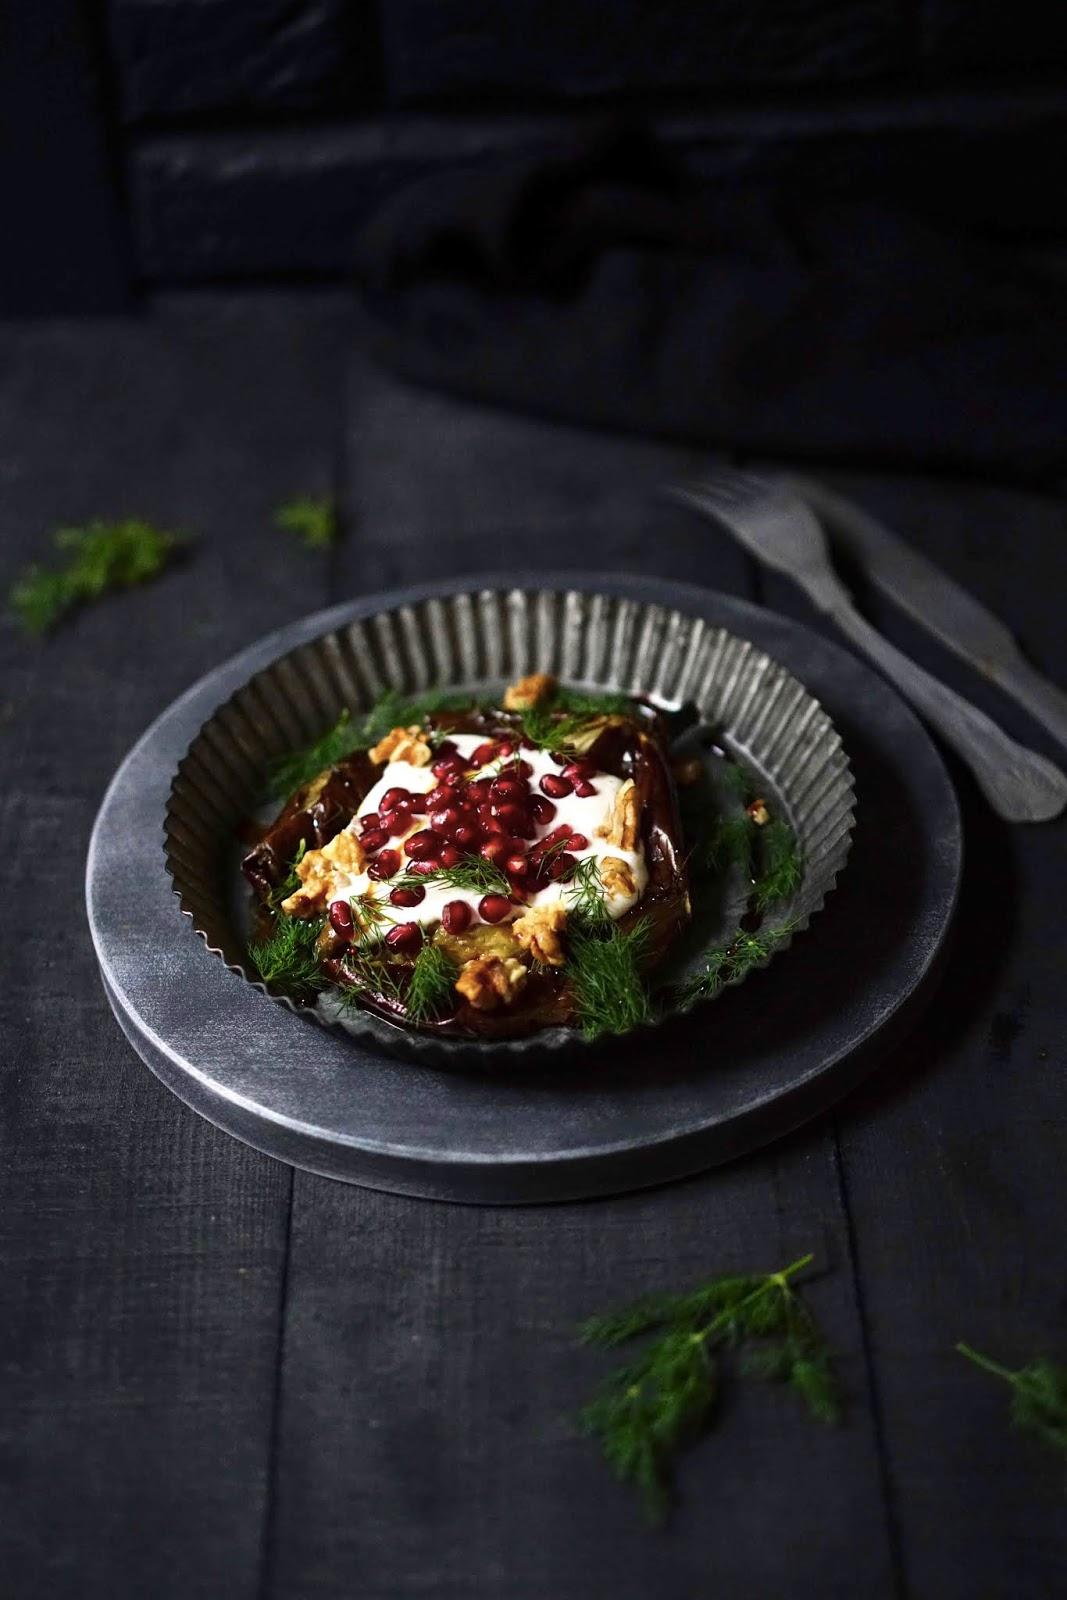 aubergines , recettes de vacance s, cuisine facile , grenade , tahini